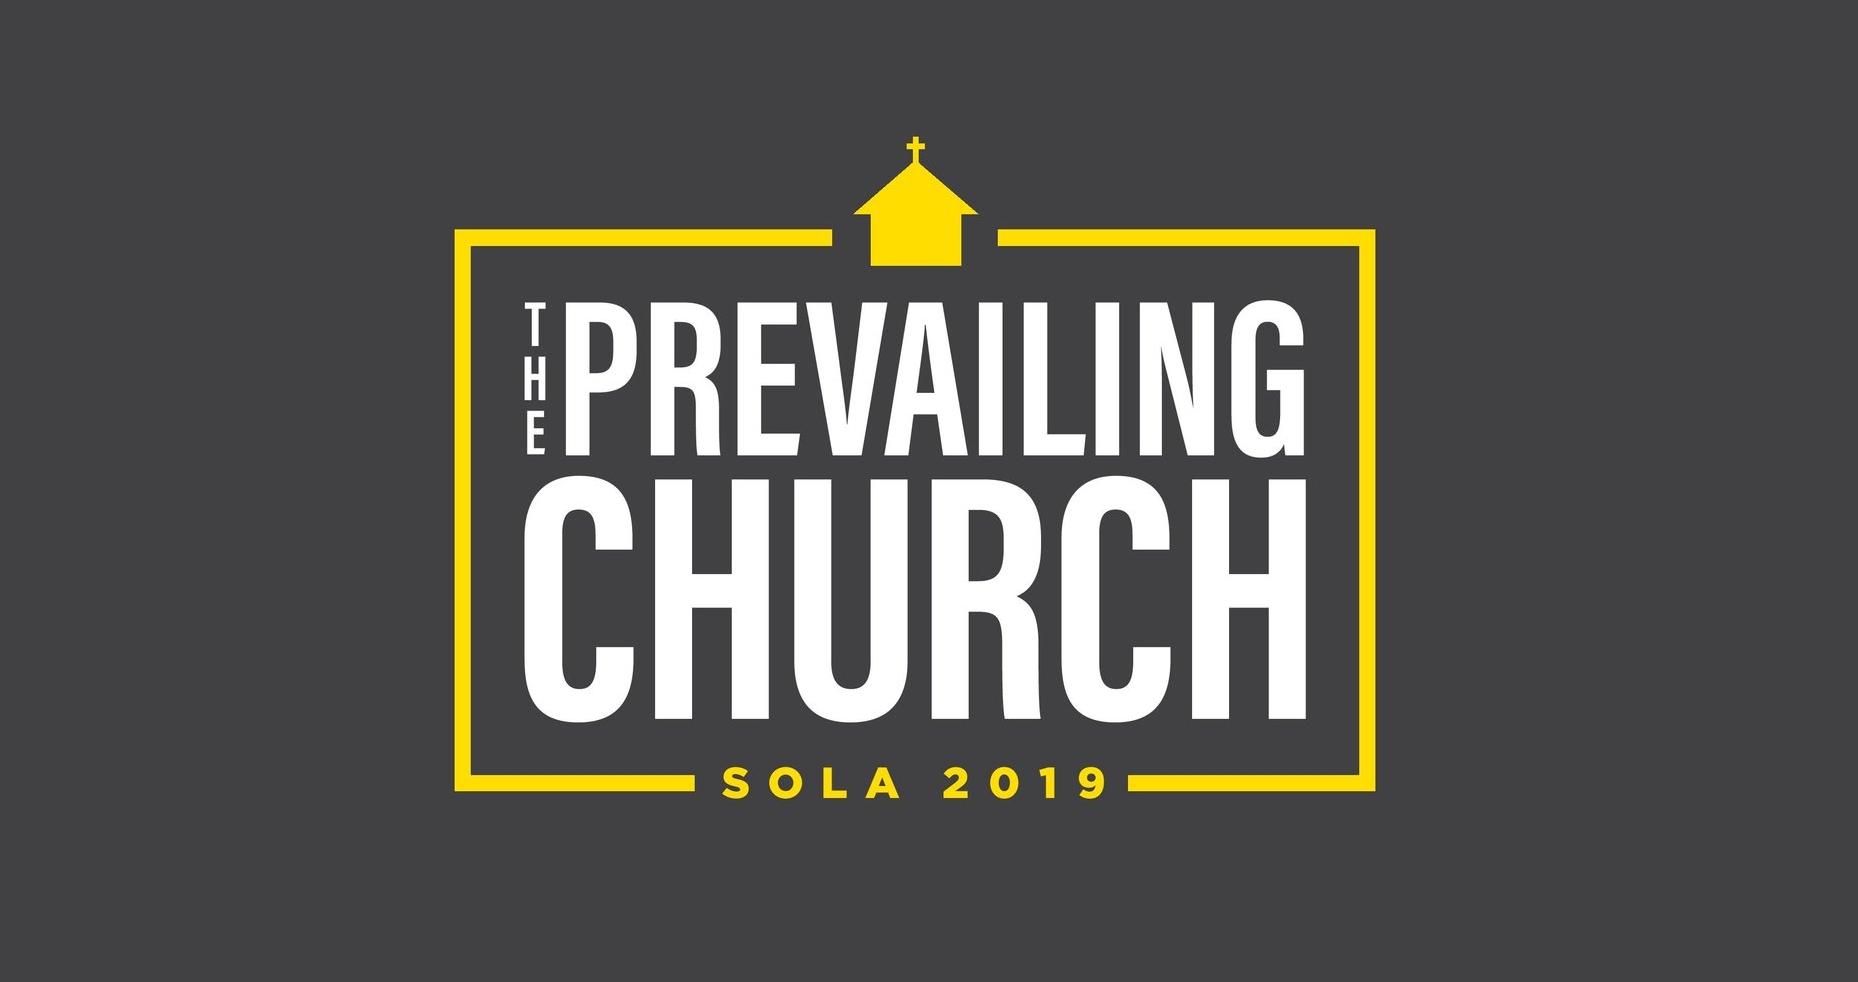 SOLA_2019_r2-page-001.jpg